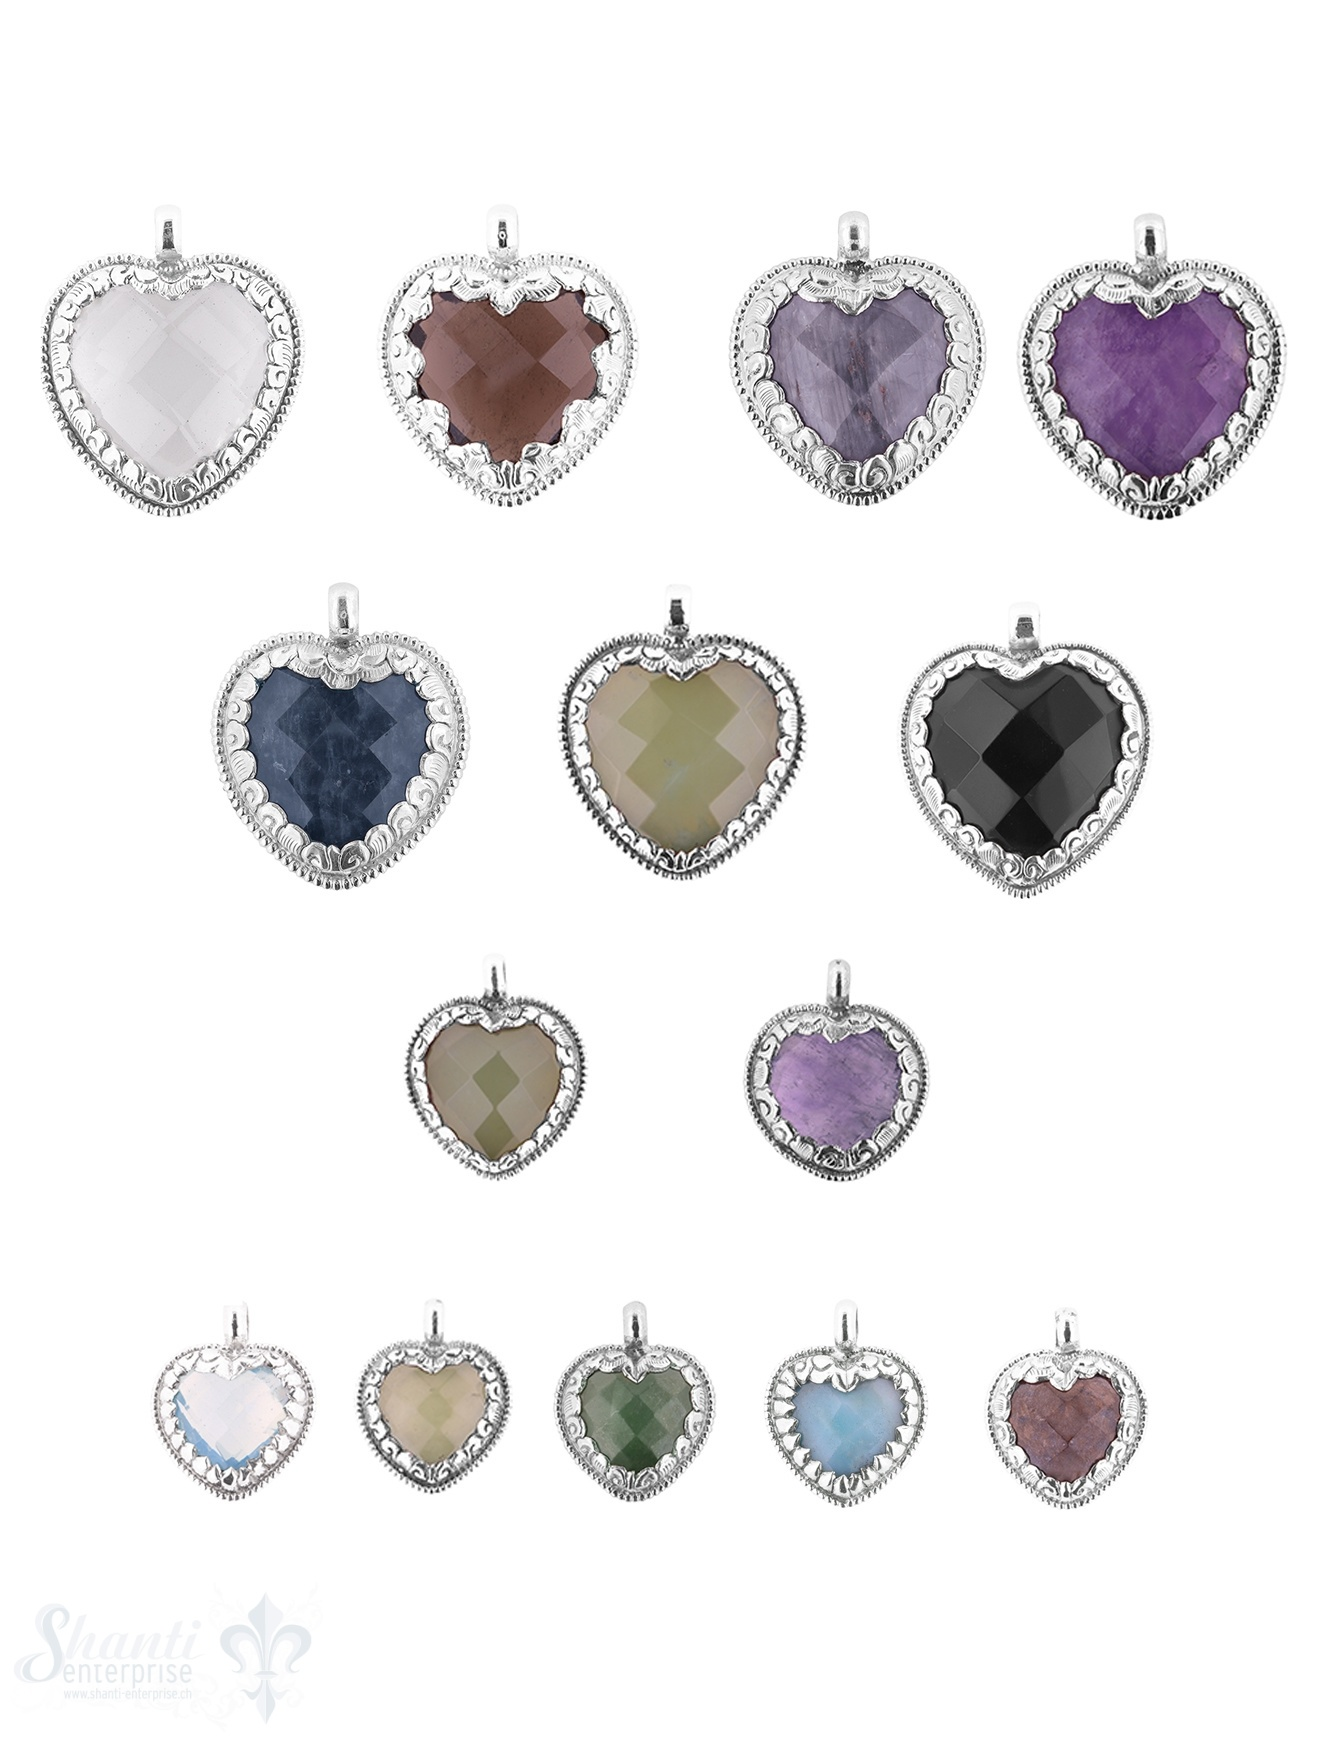 Herz Anhänger Silber mit Gefasstem Stein facettiert verziert massiv Öse fix Handmade